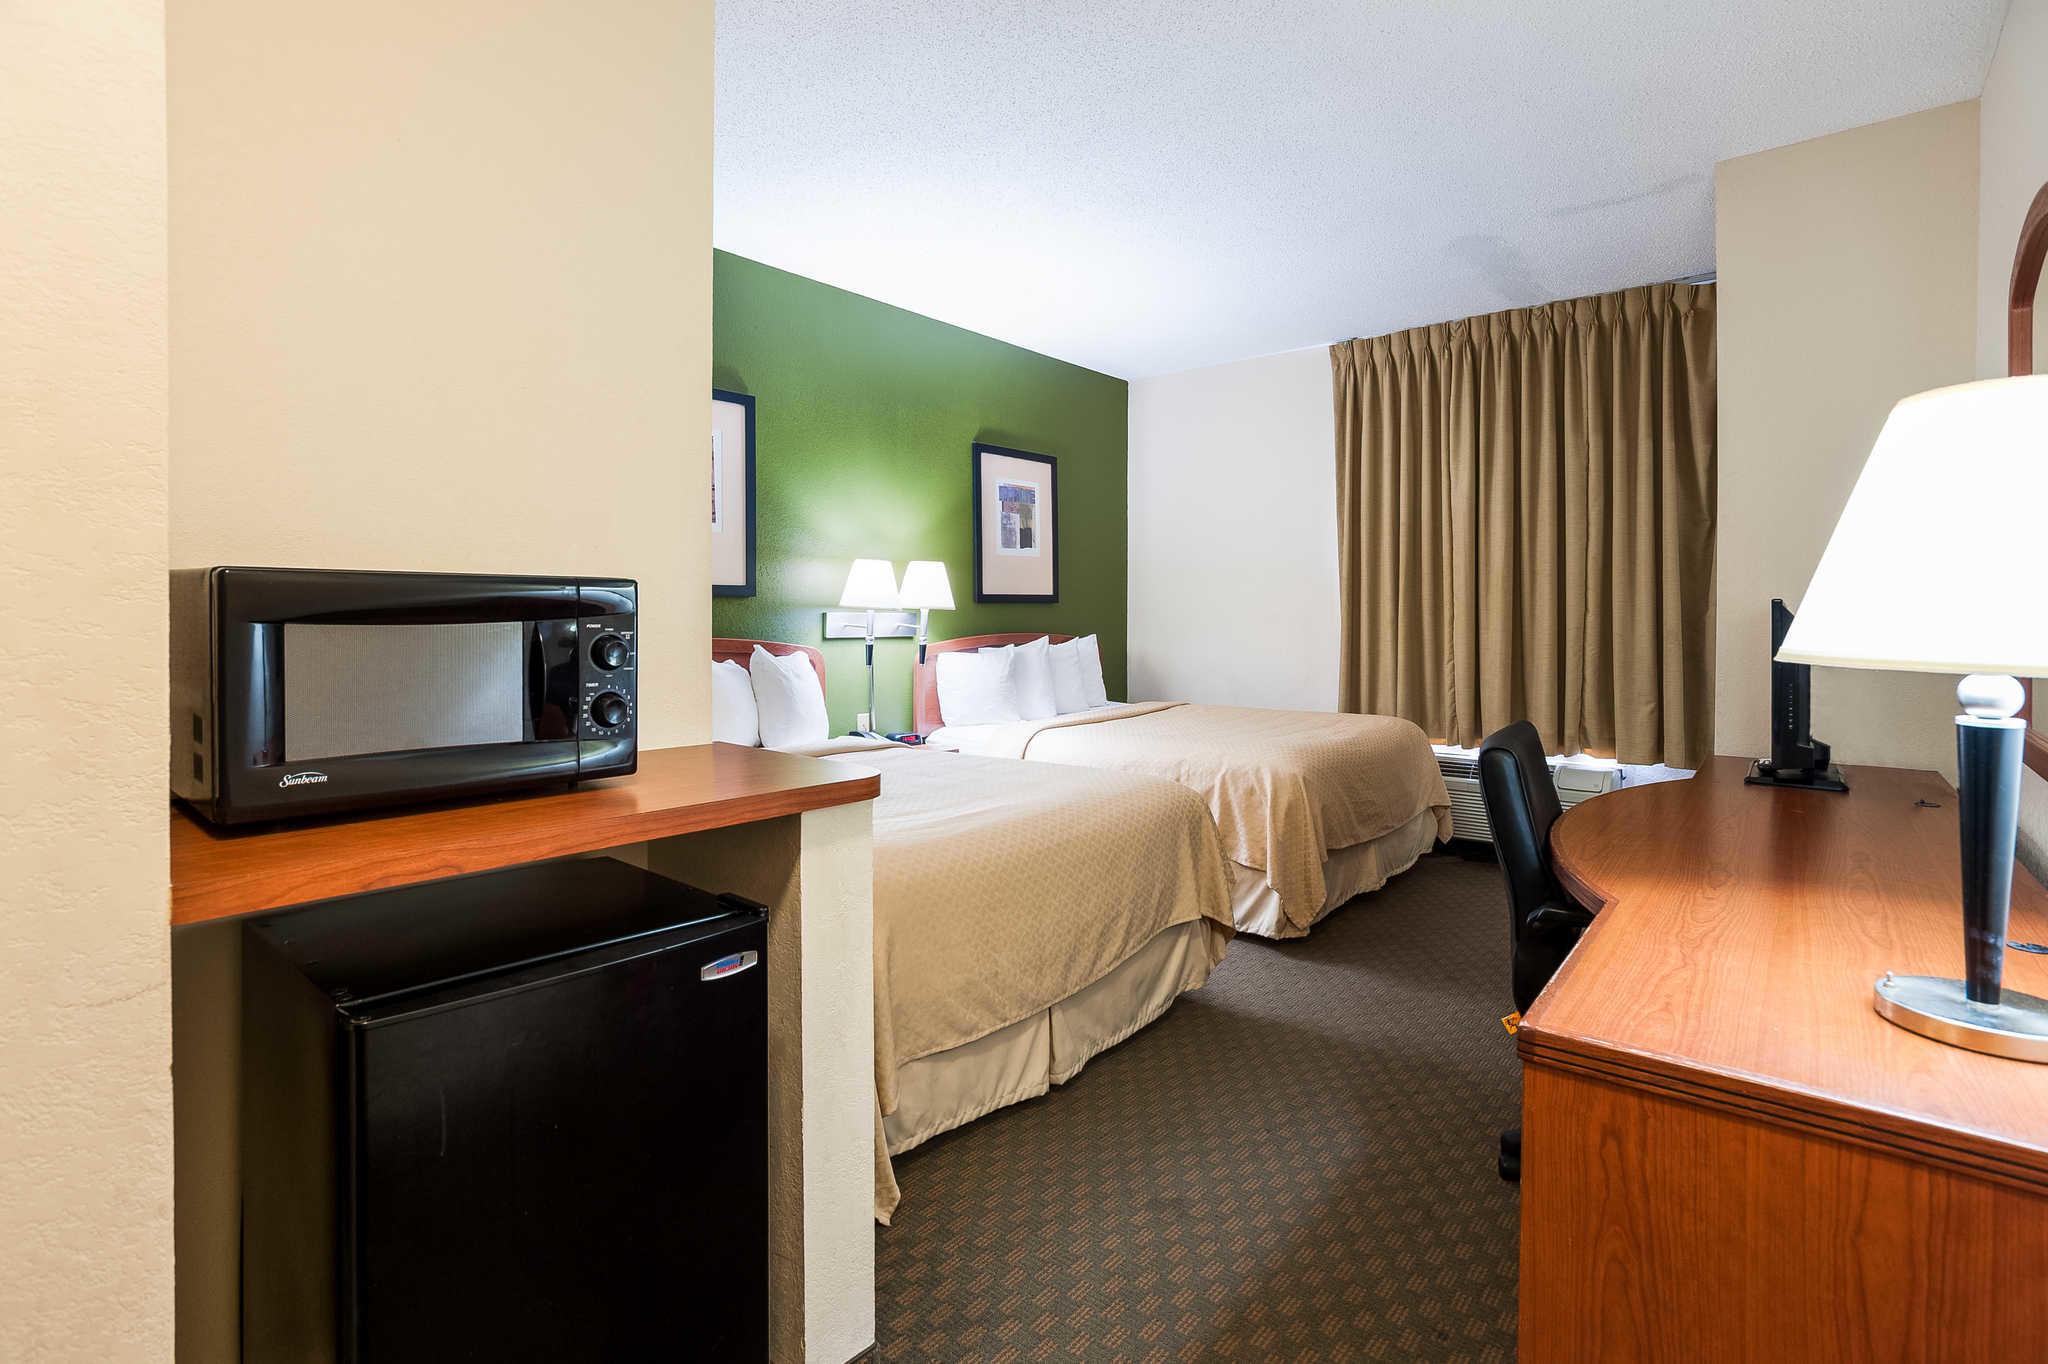 Quality Inn & Suites image 30